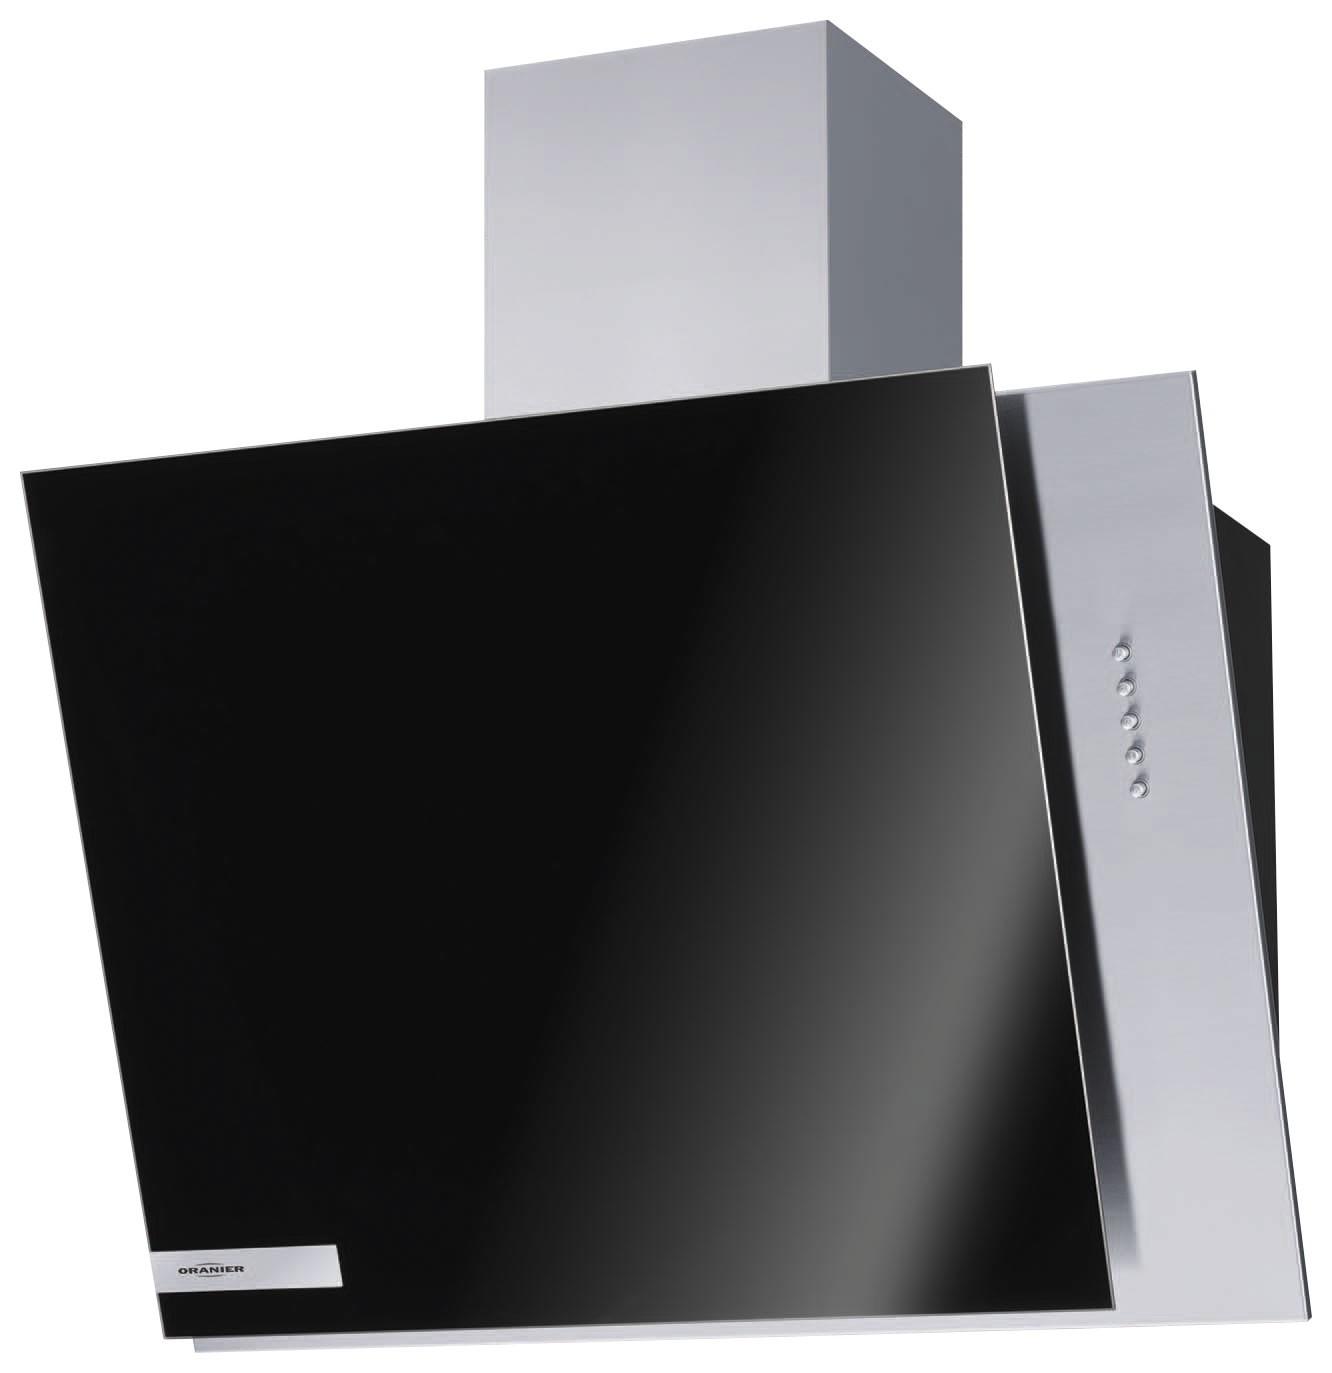 oranier dunstabzugshauben kopffrei wandhaube clario s. Black Bedroom Furniture Sets. Home Design Ideas